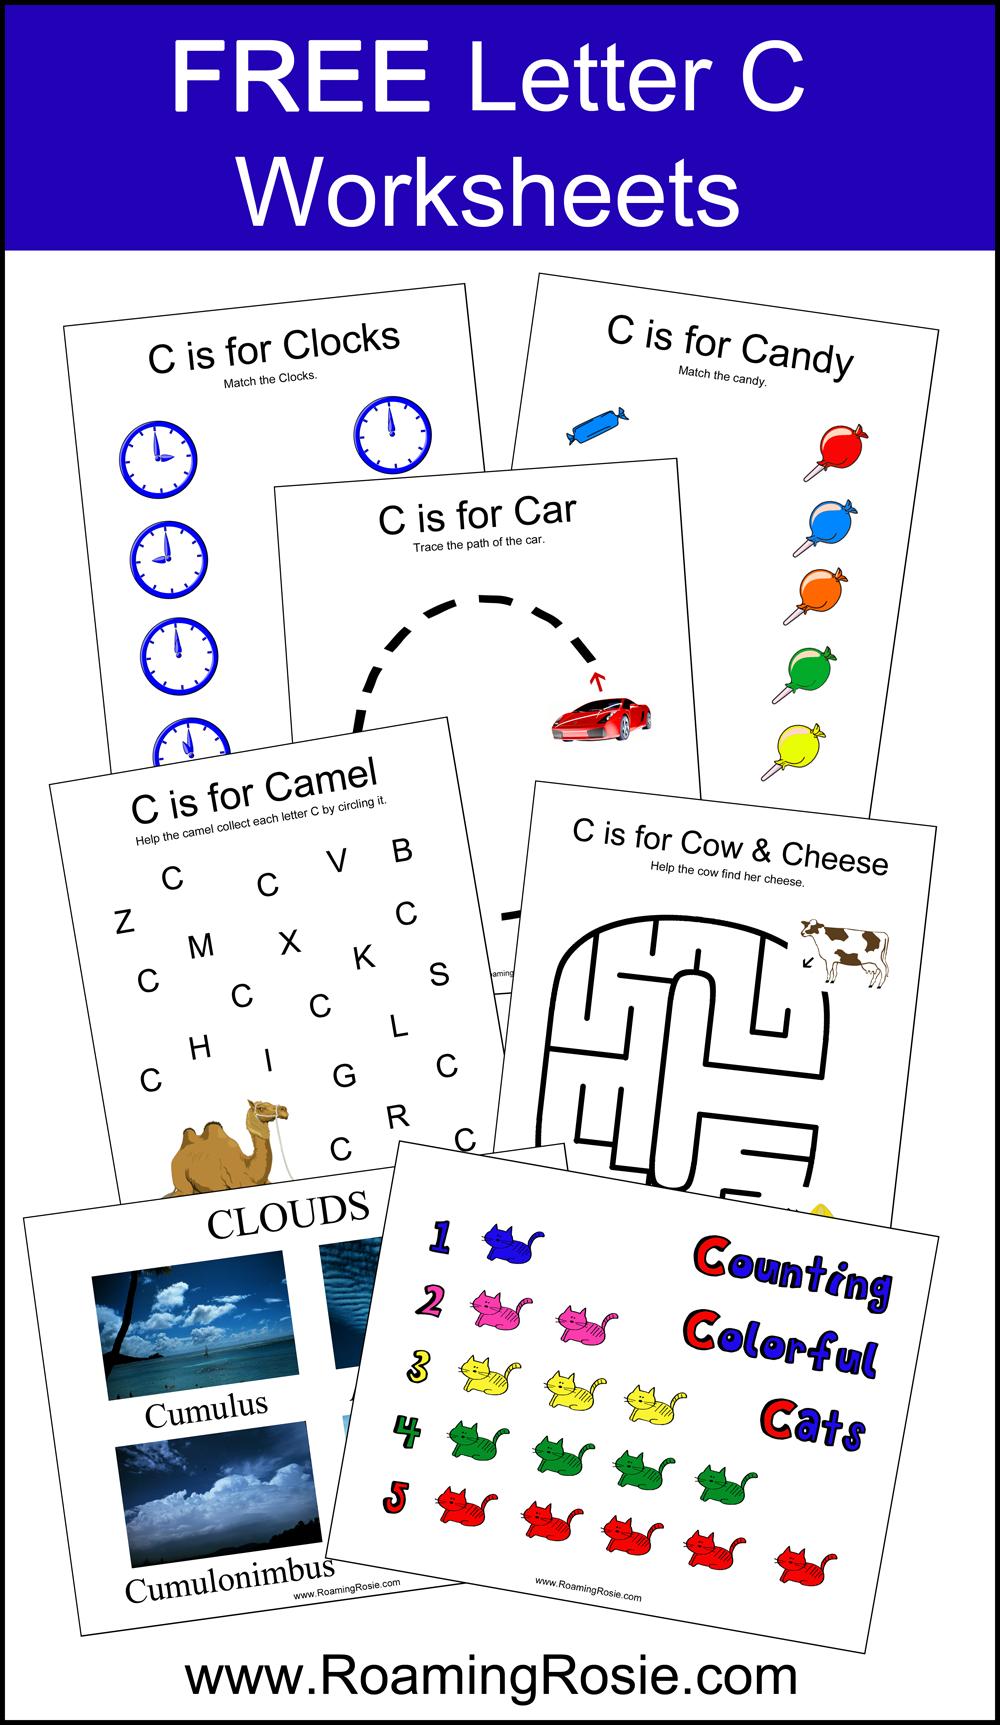 math worksheet : letter c free alphabet worksheets for kids  roaming rosie : Letter C Worksheets For Kindergarten